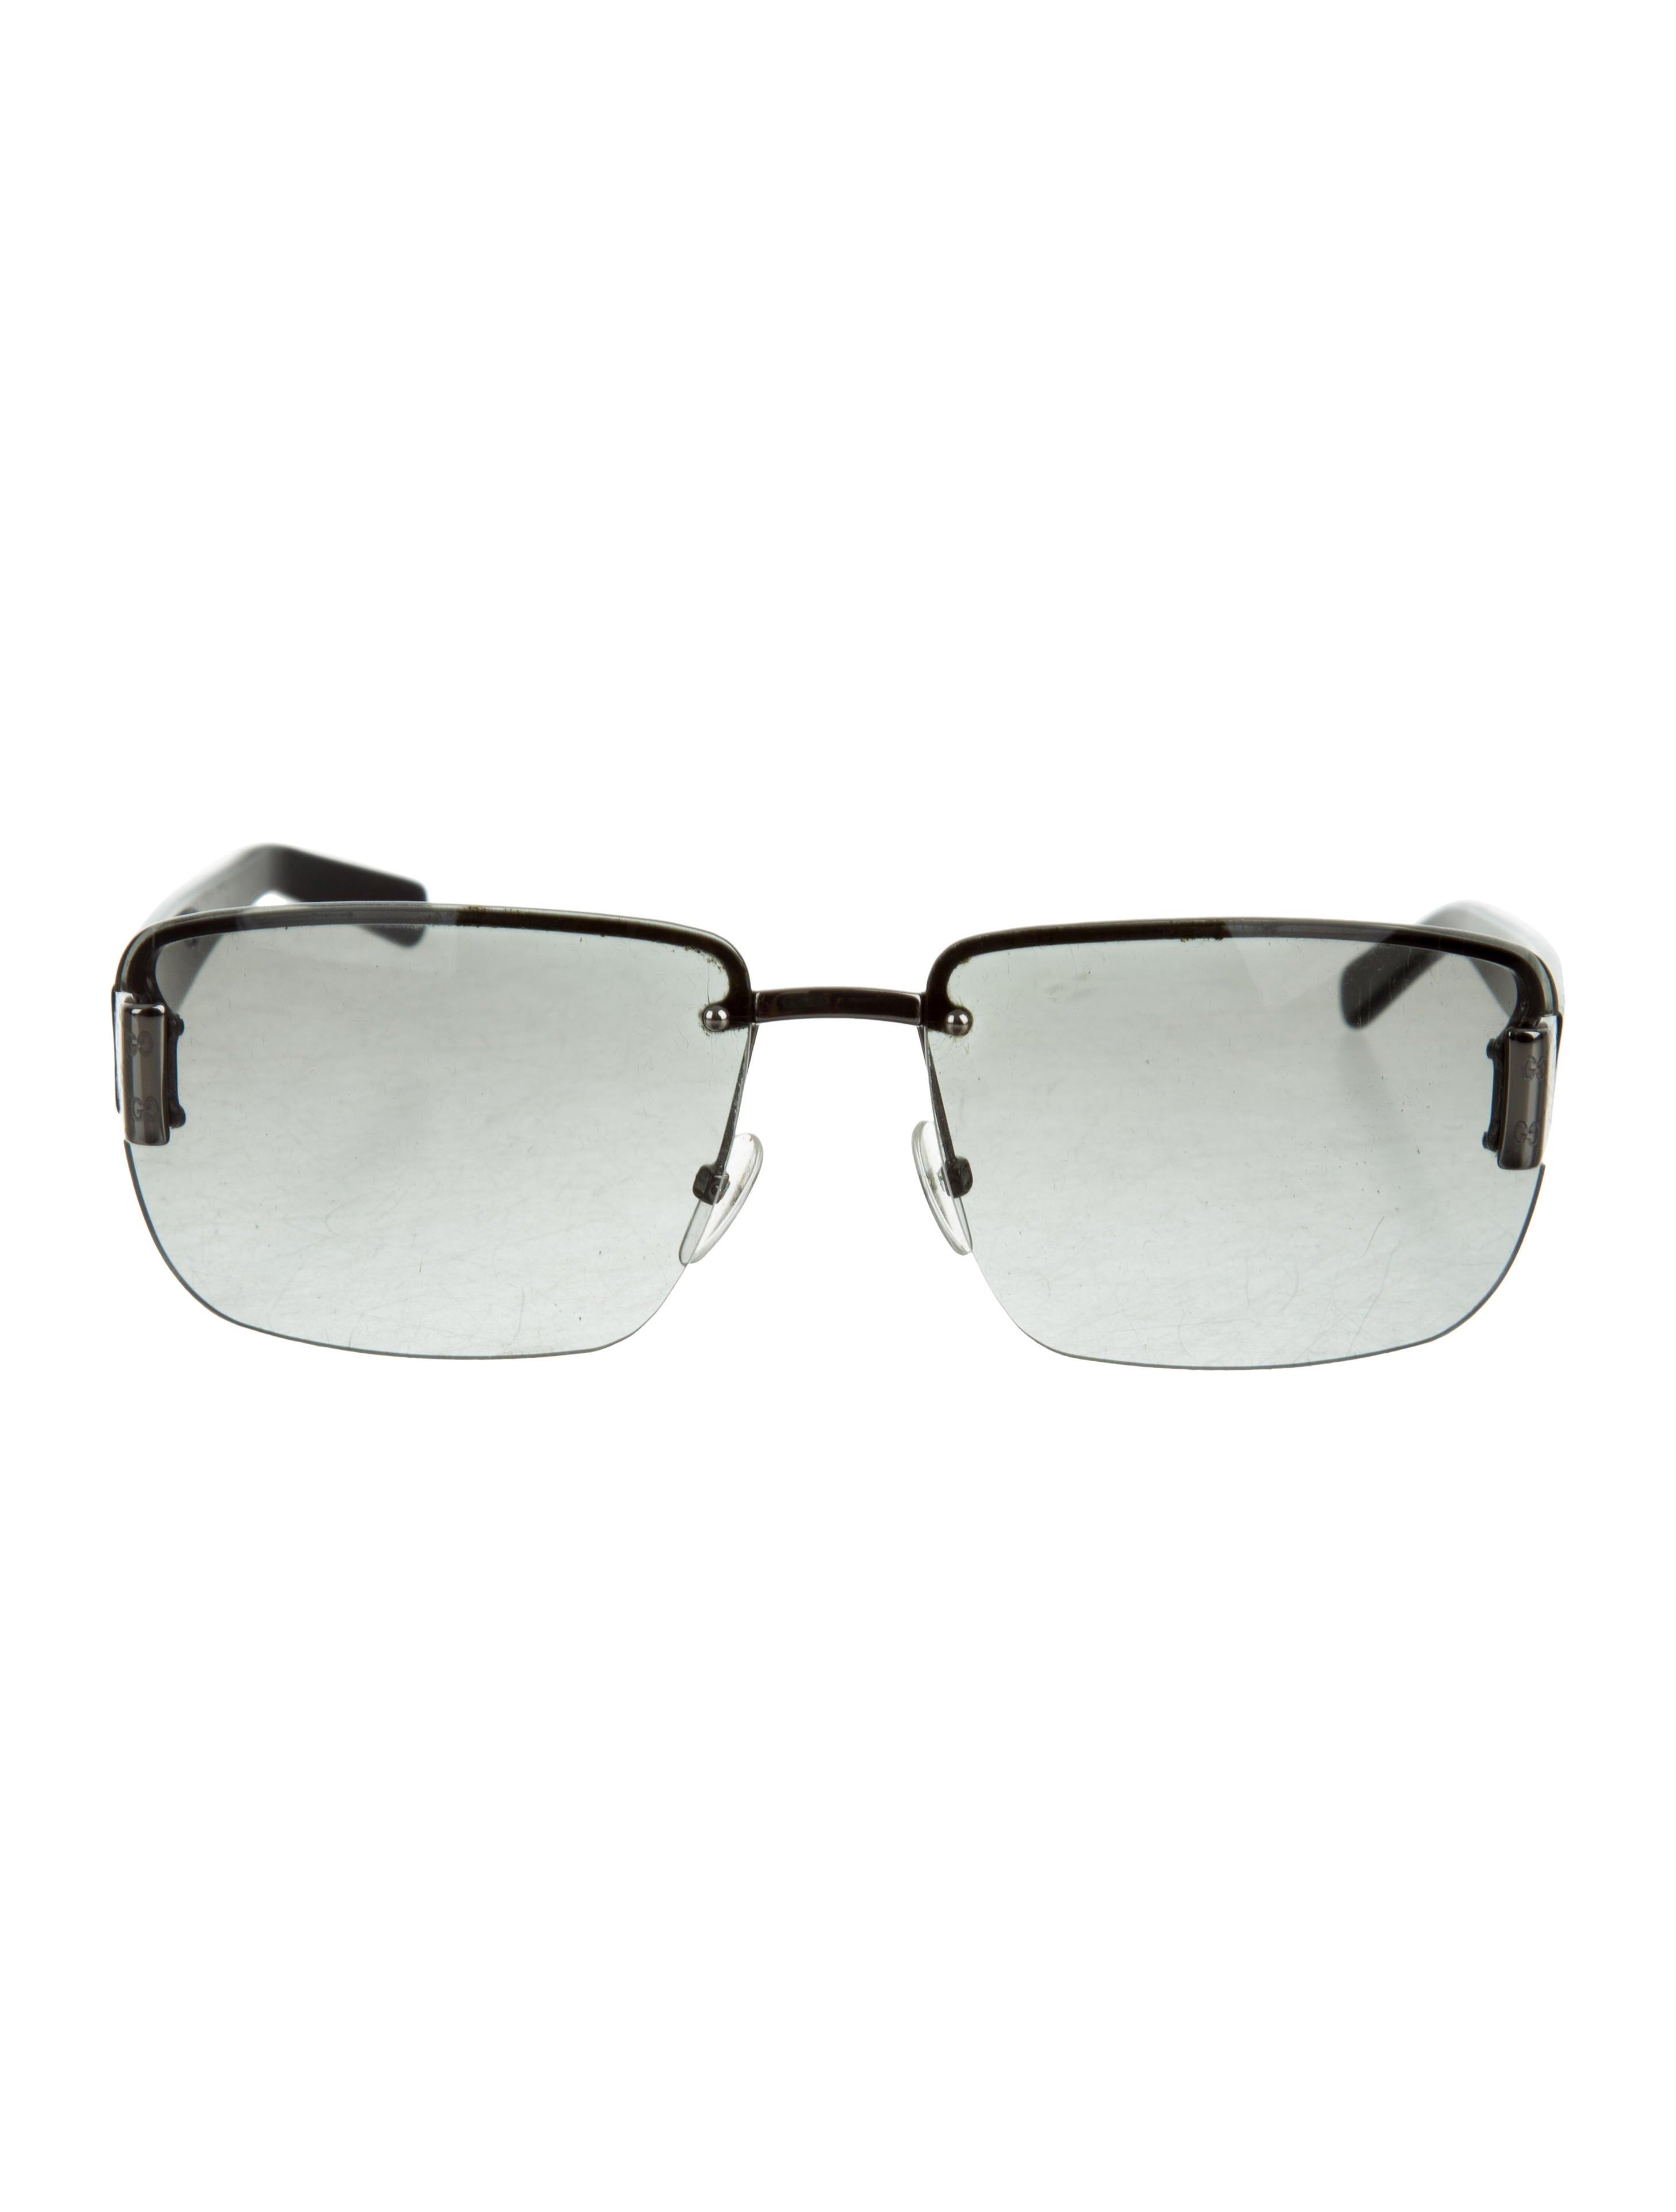 0ba45911041 Gucci Rimless Glasses Frames